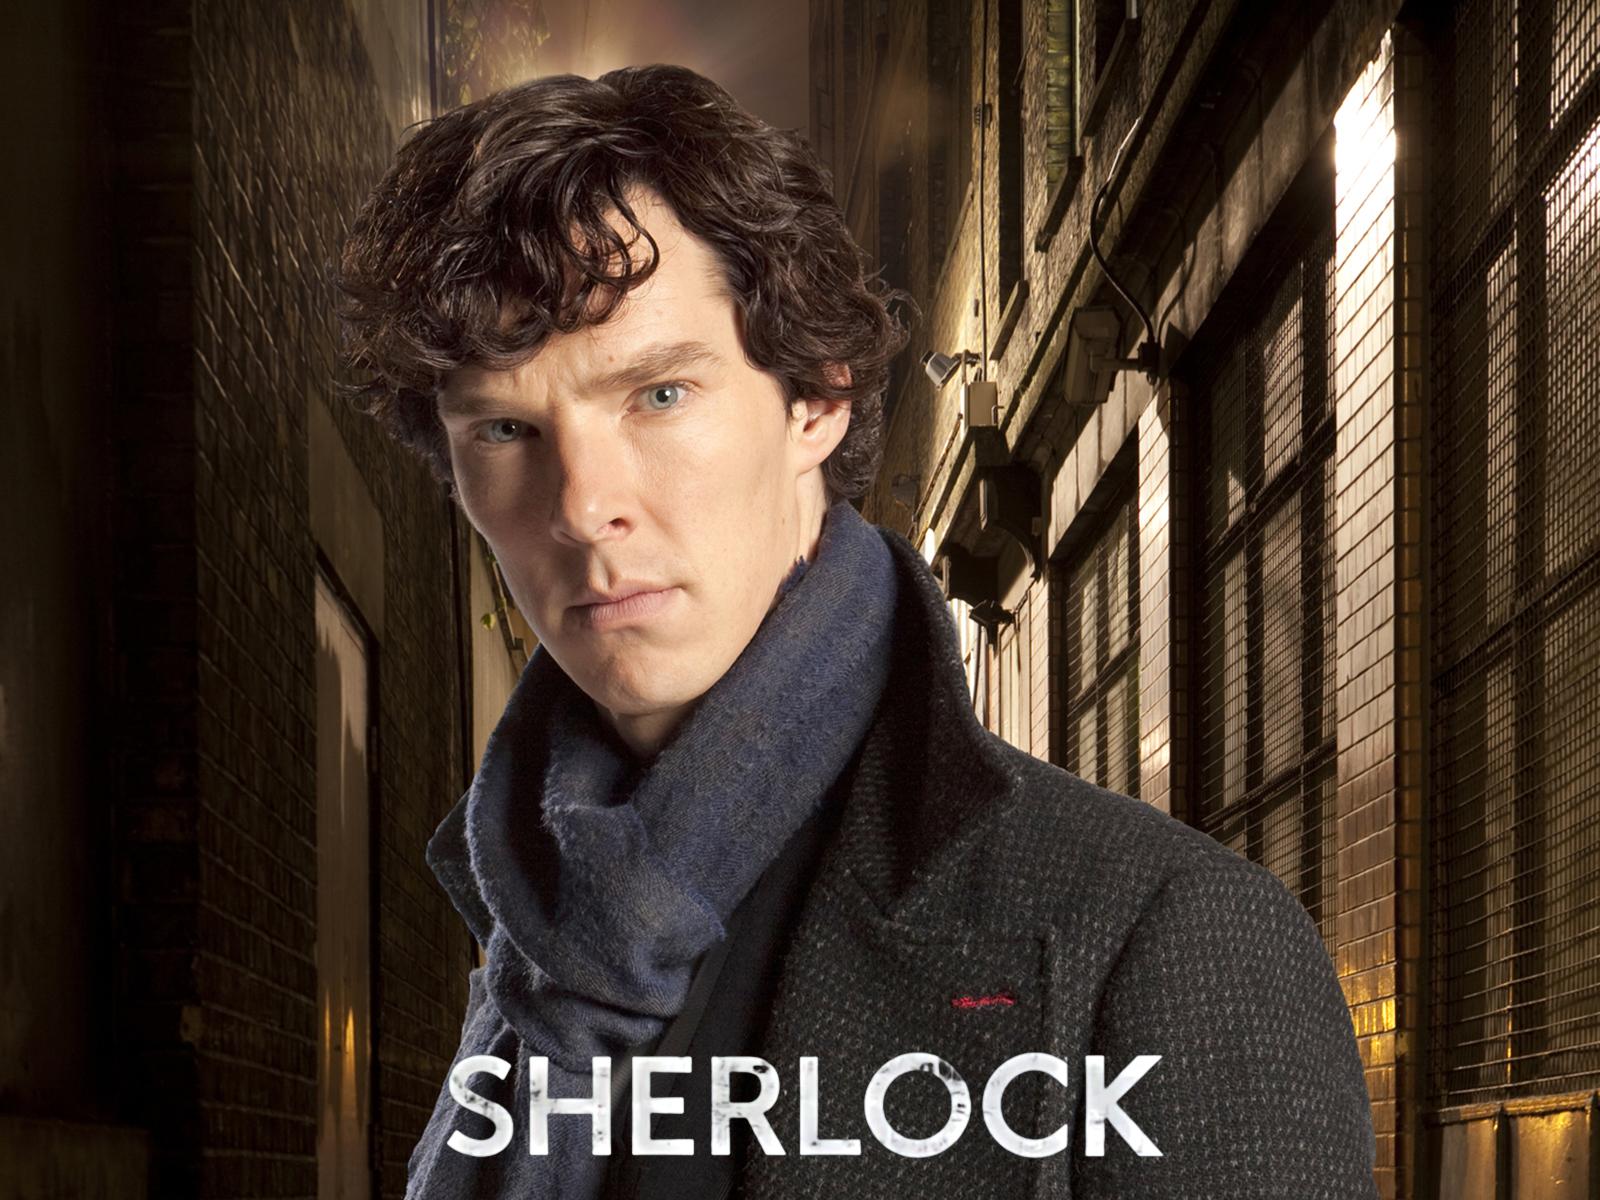 sherlock tv series wallpaper - photo #6